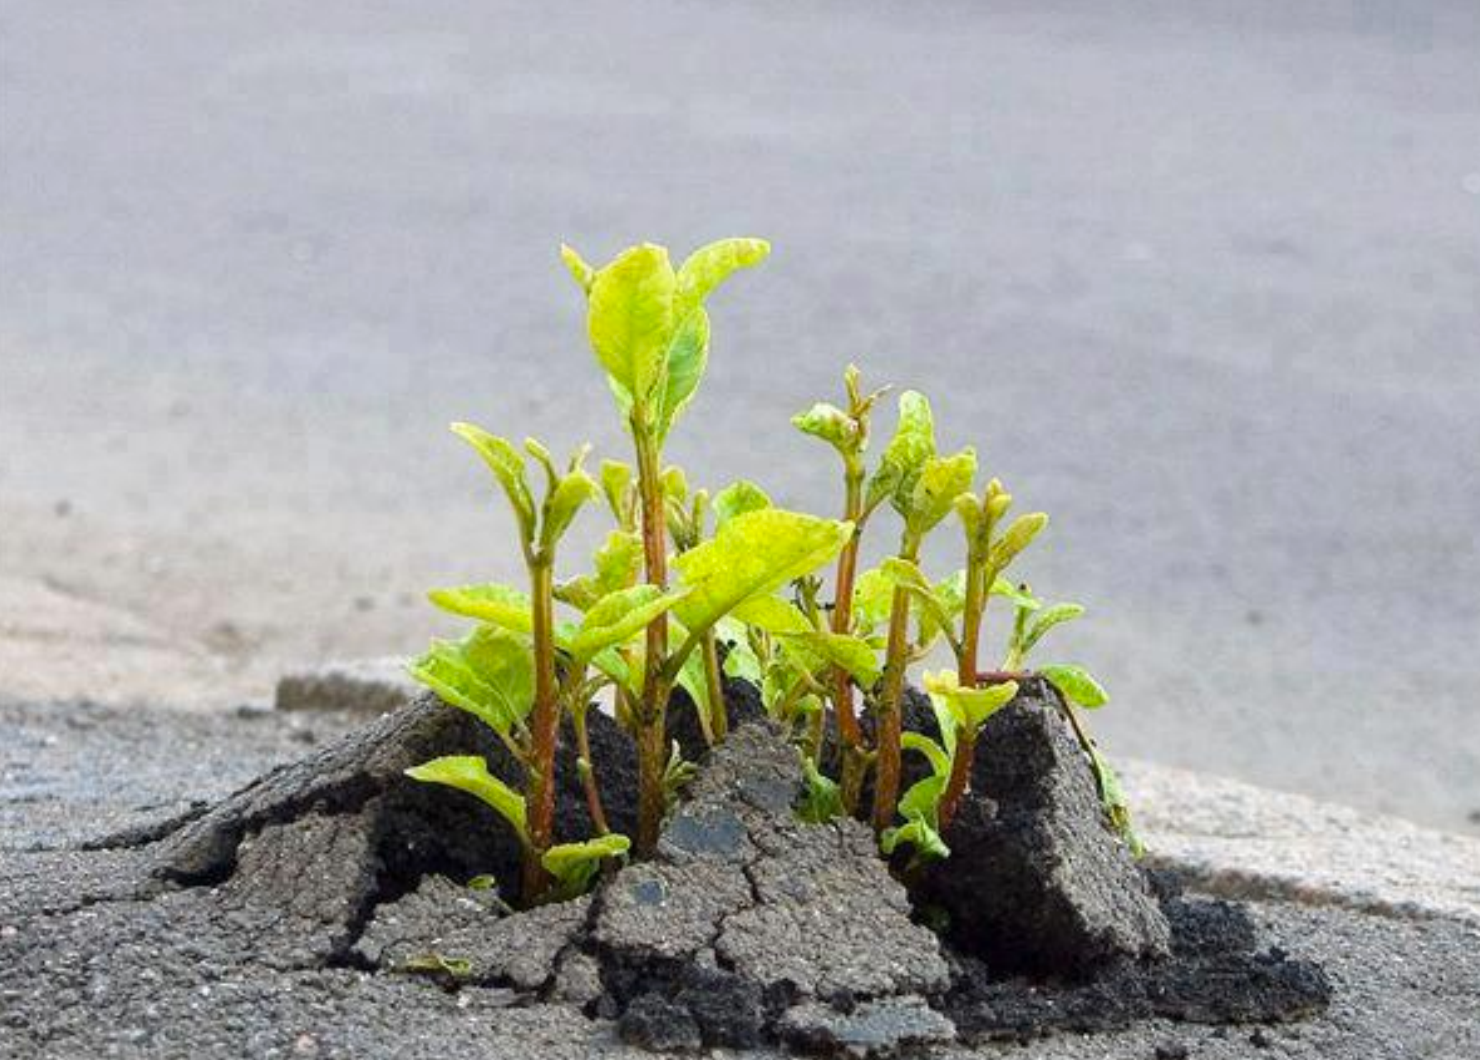 Sprouts through the concrete